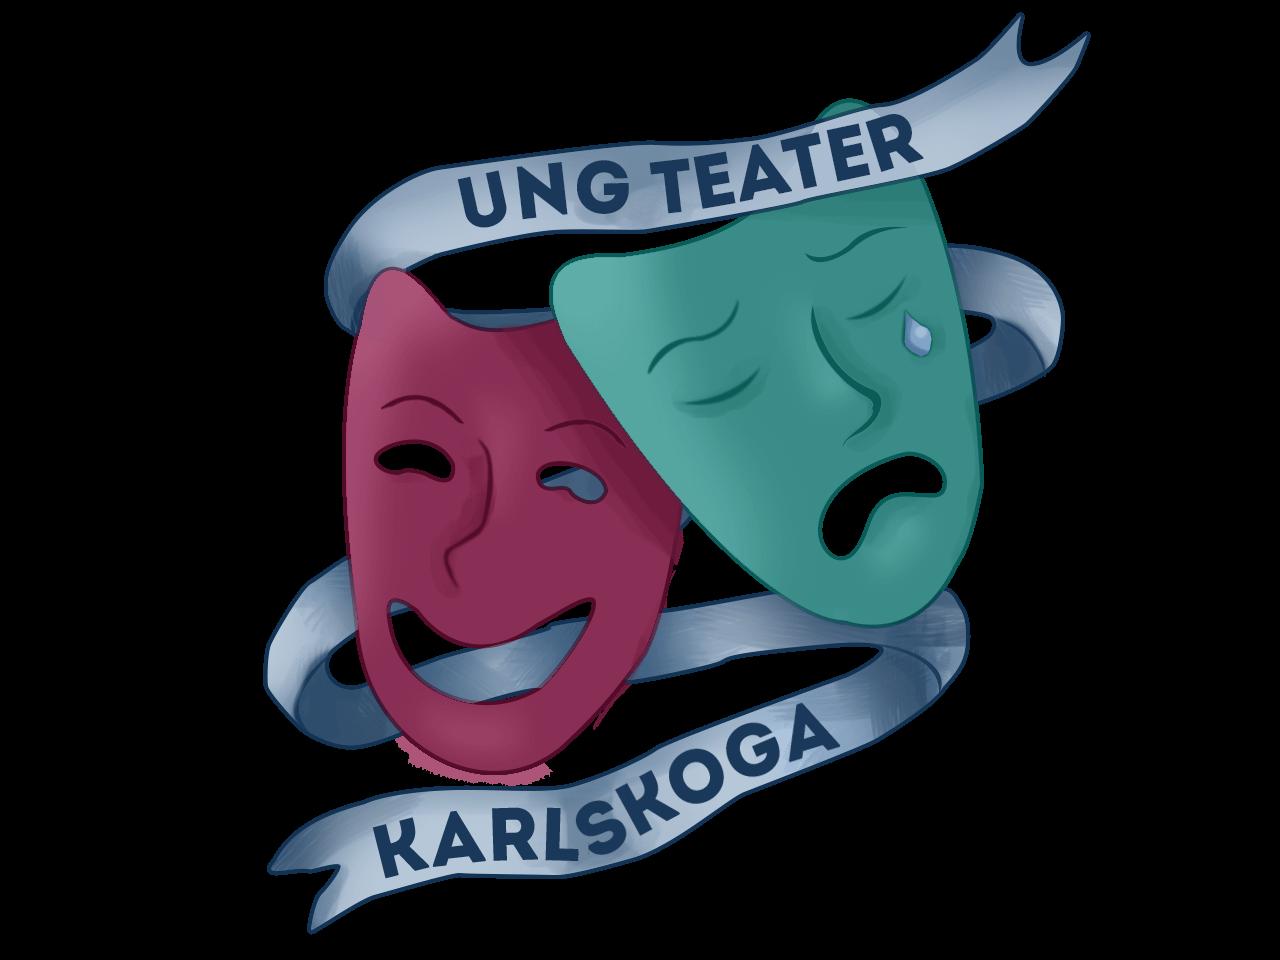 Ung Teater Karlskoga